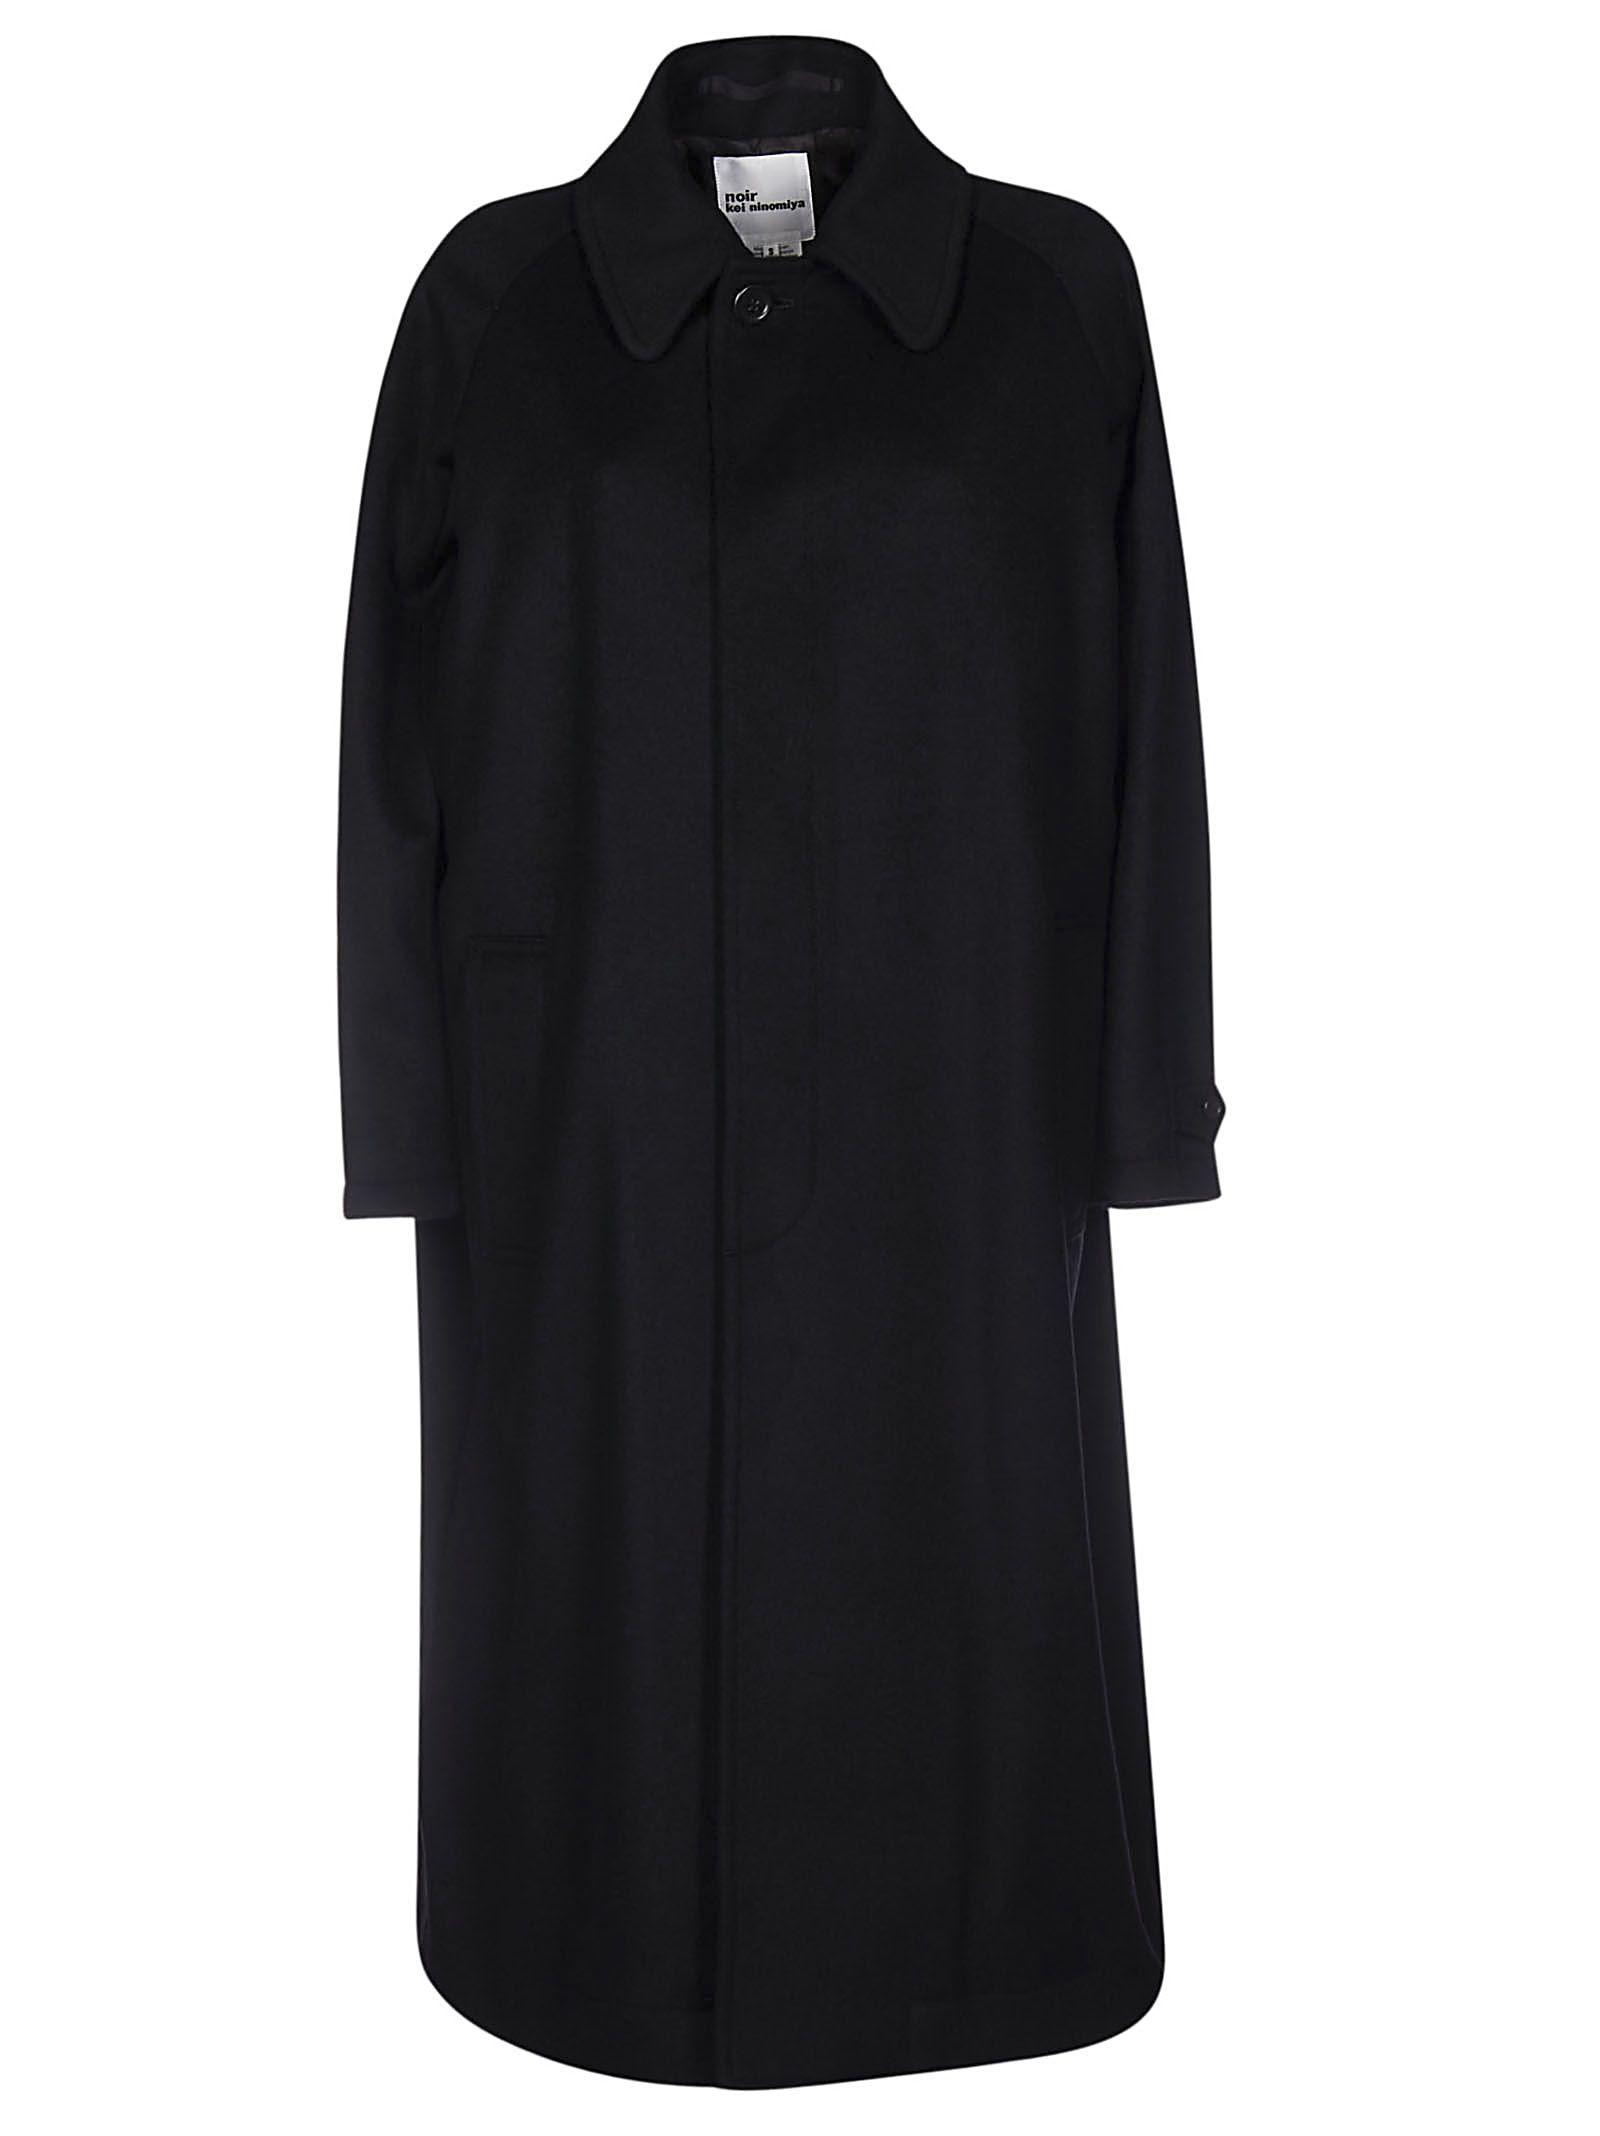 Noir Kei Ninomiya Single-breasted Oversized Coat